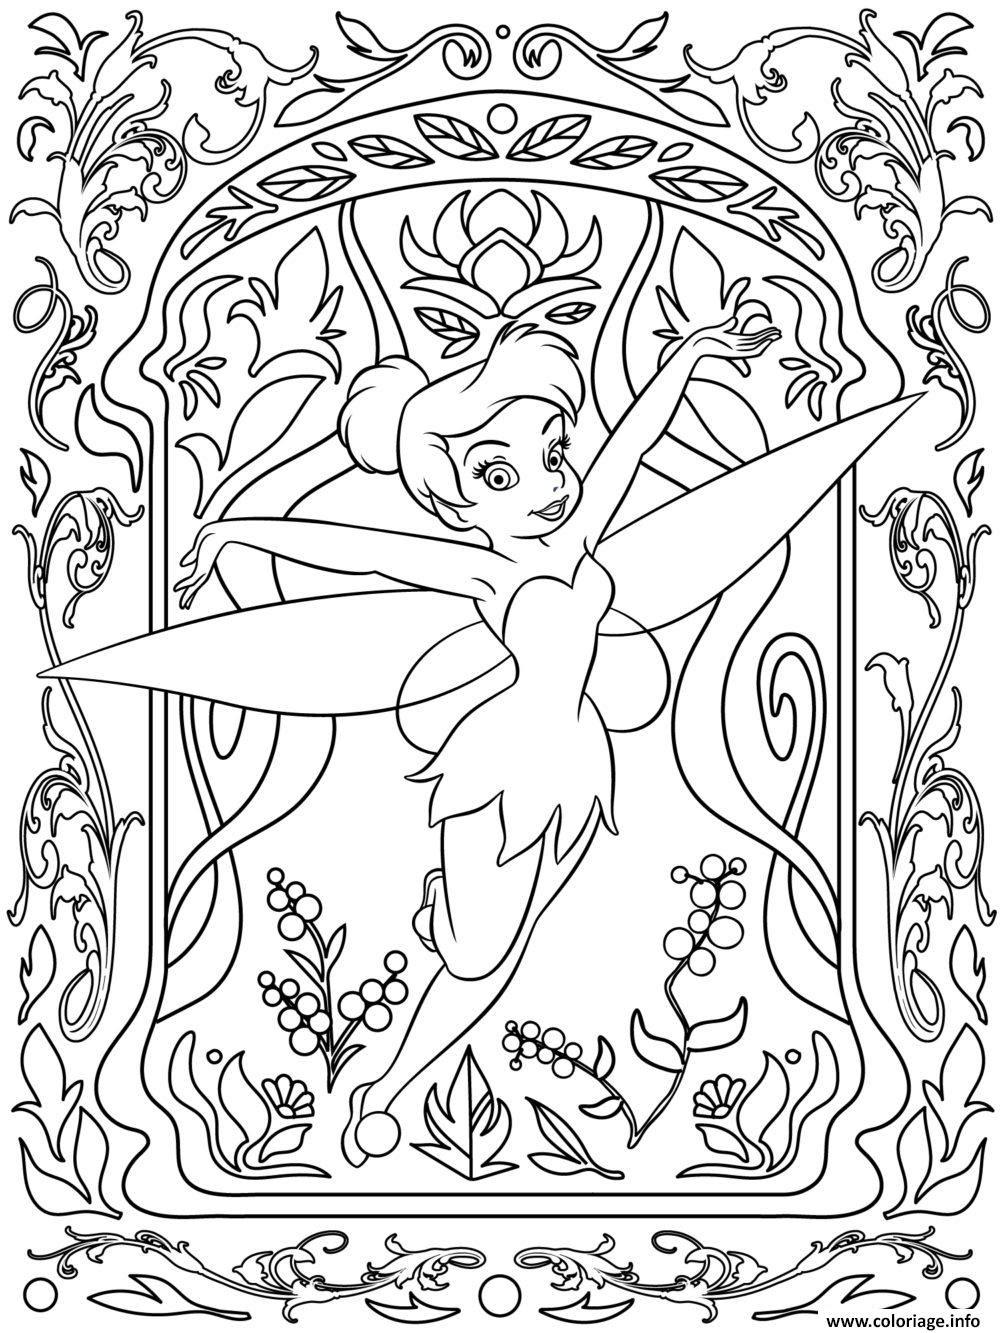 Coloriage Mandala Disney Tinker Bell Dessin  Imprimer